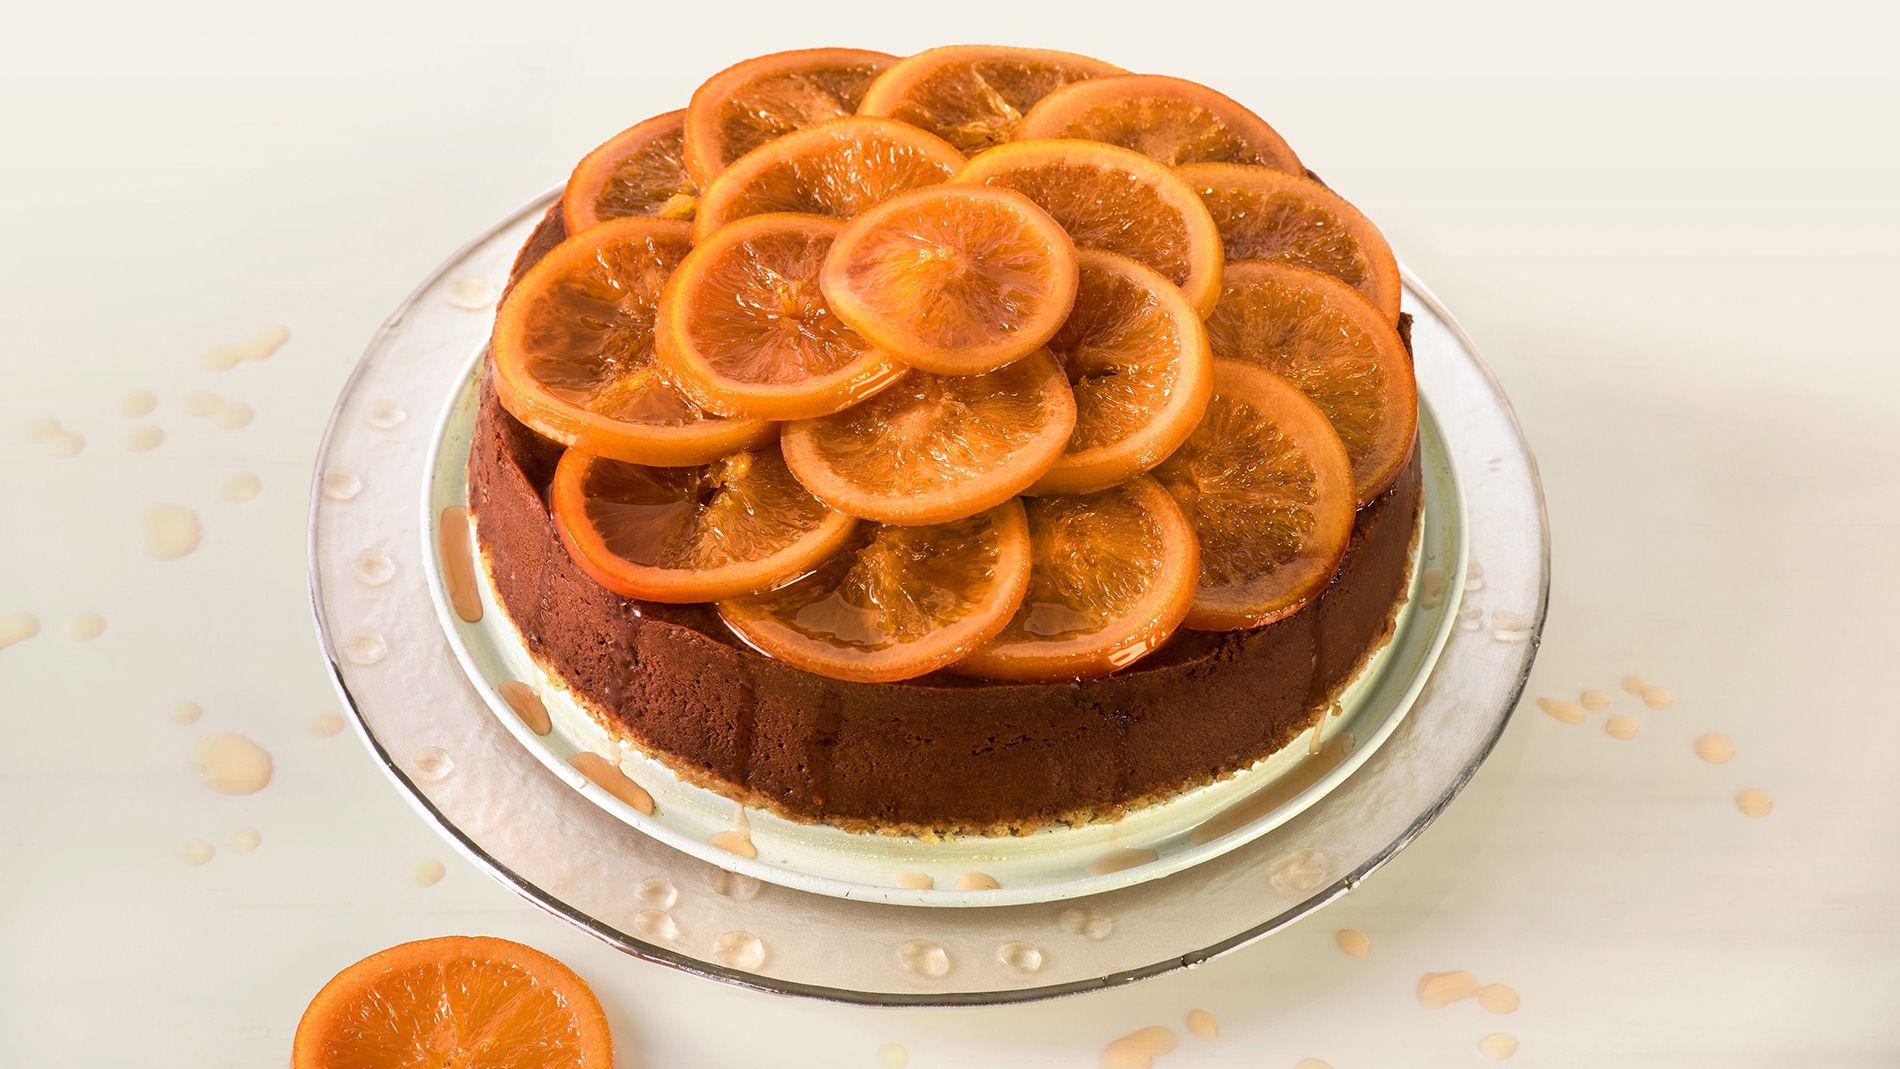 Baked Orange Chocolate Cheesecake Recipe Lindt Everyday Excellence Recipe Cheesecake Recipes Orange Baking Chocolate Orange Cheesecake